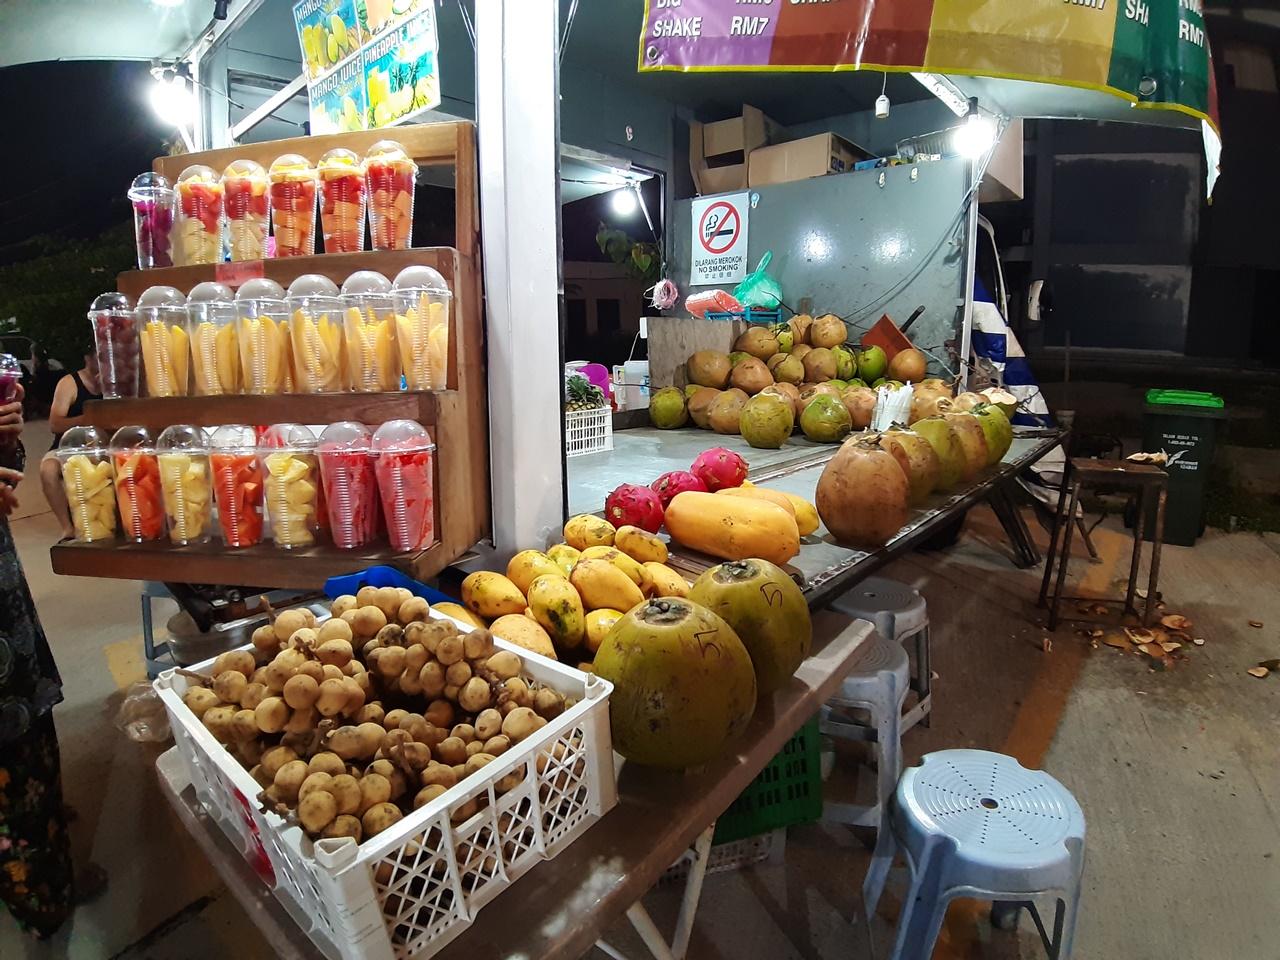 ovocné smoothies